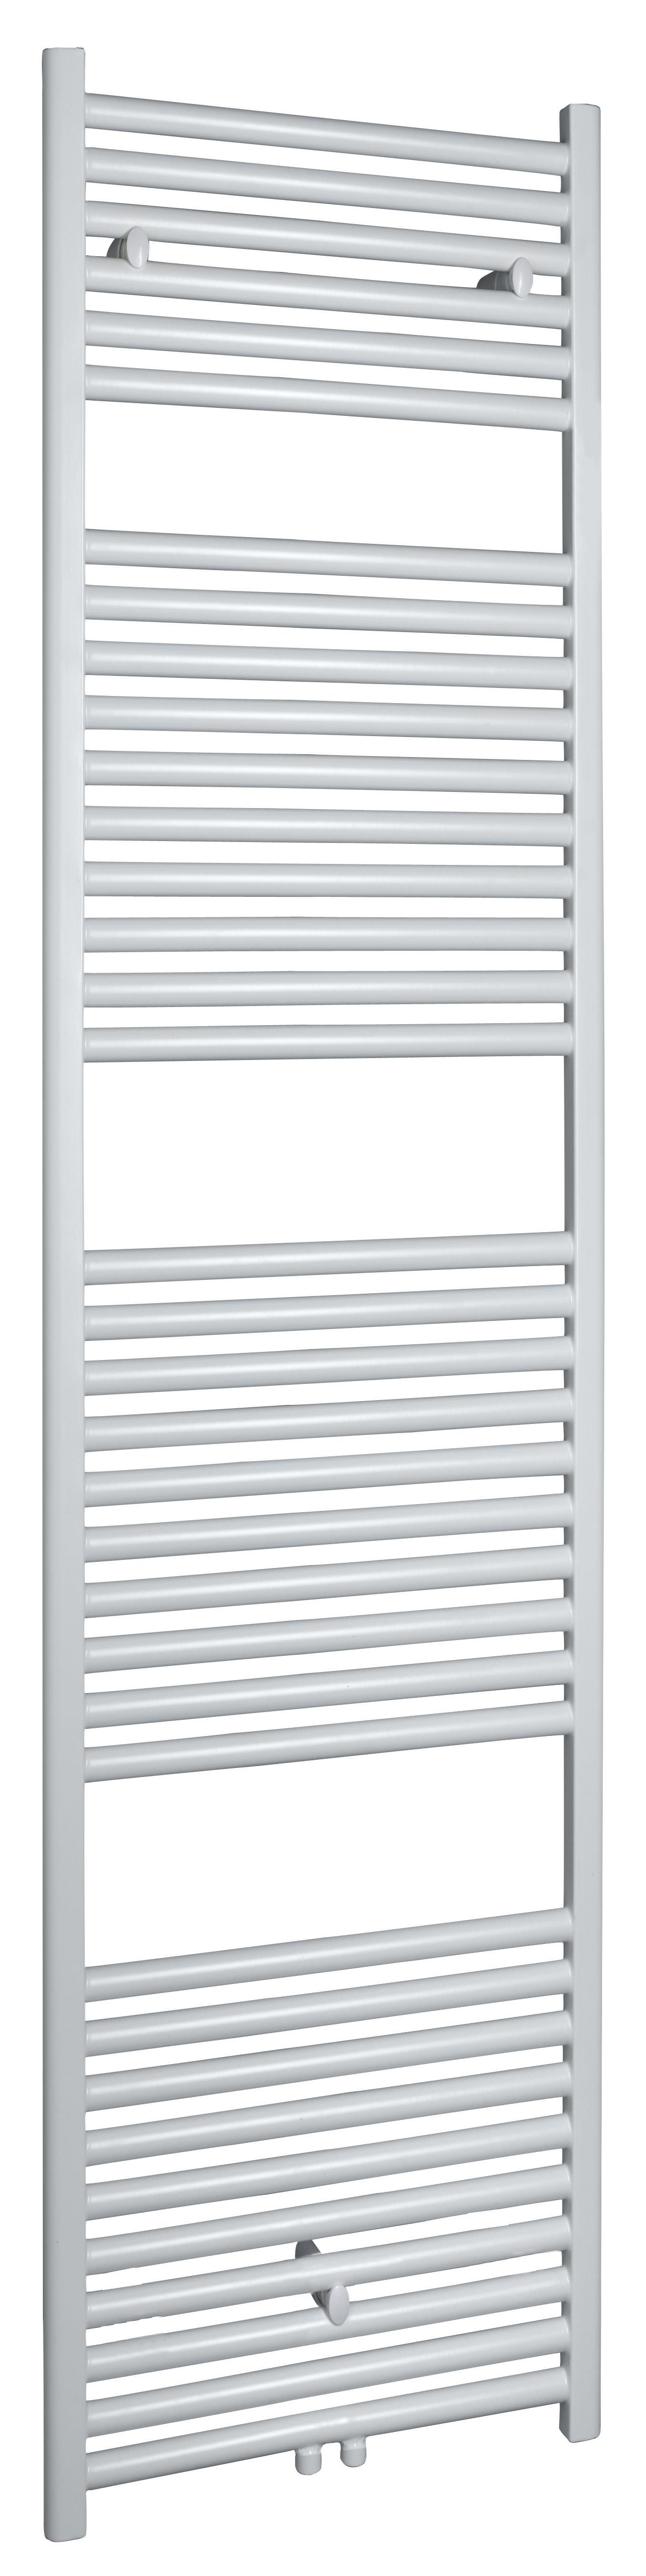 Wiesbaden Elara sierradiator 180x45 cm wit midden/onderaansluiting